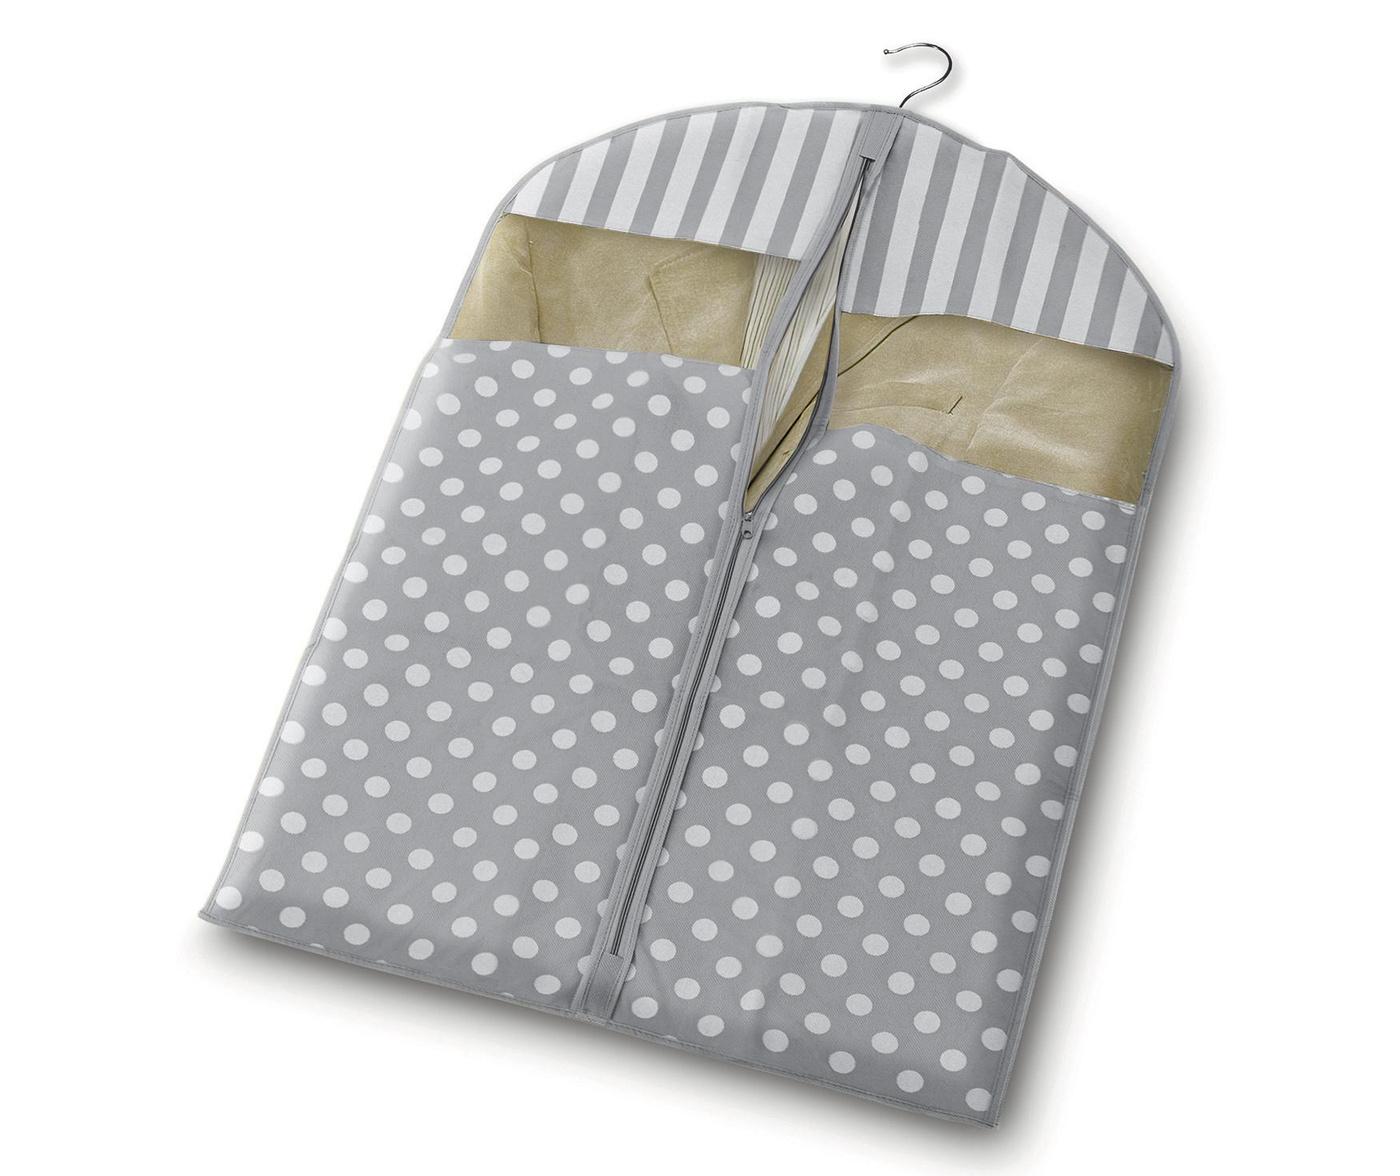 Husa pentru haine Lines&Dots 60x100 cm